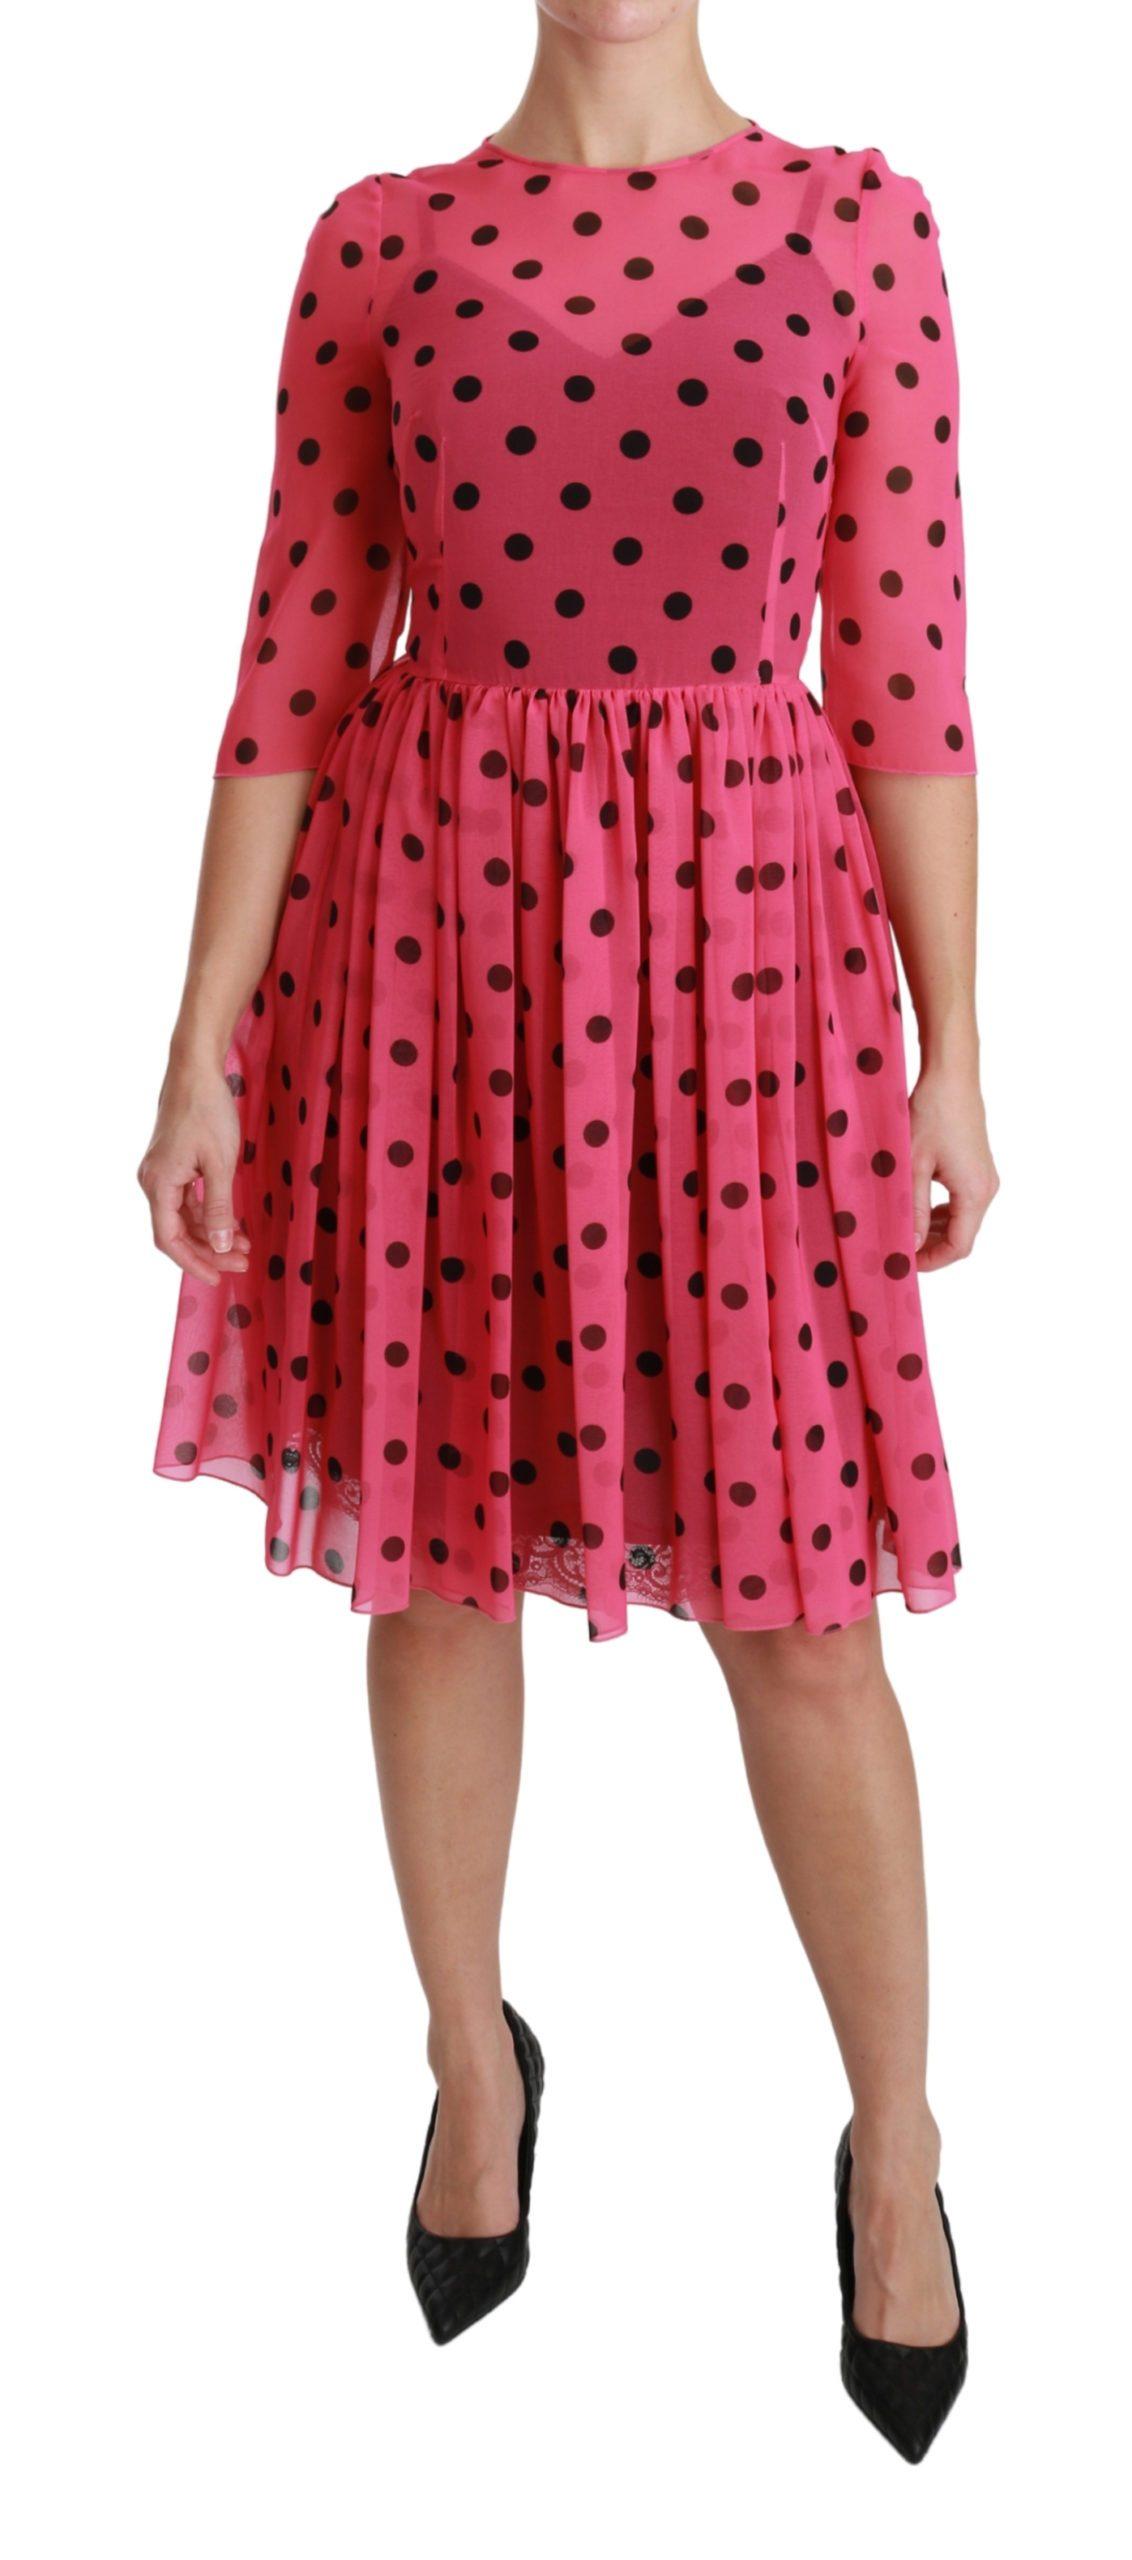 Dolce & Gabbana Women's Polka Dots A-line Knee Length Dress Pink DR2539 - IT38 XS